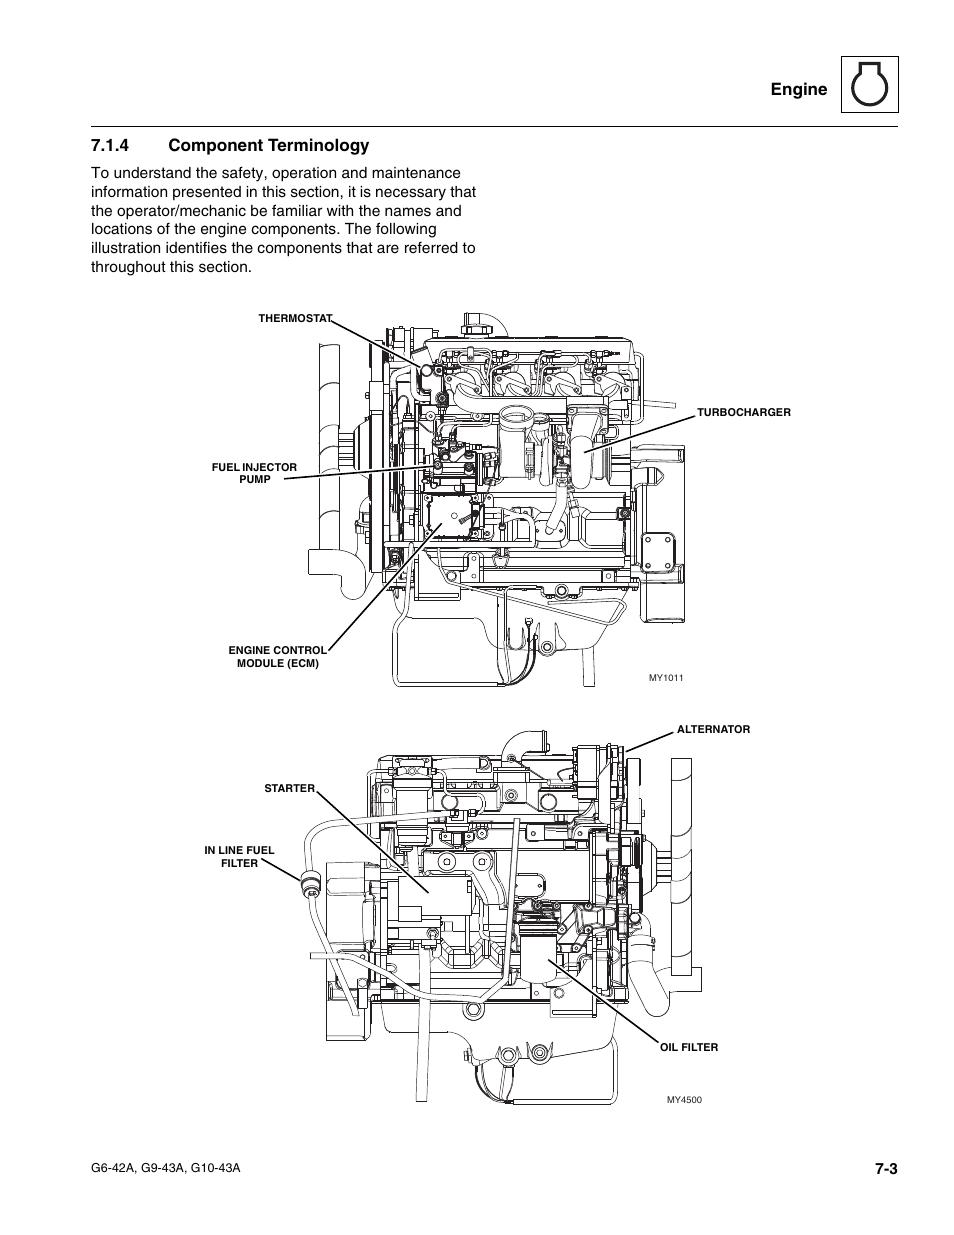 4 component terminology, Component terminology, Engine 7.1.4 component  terminology | JLG G6